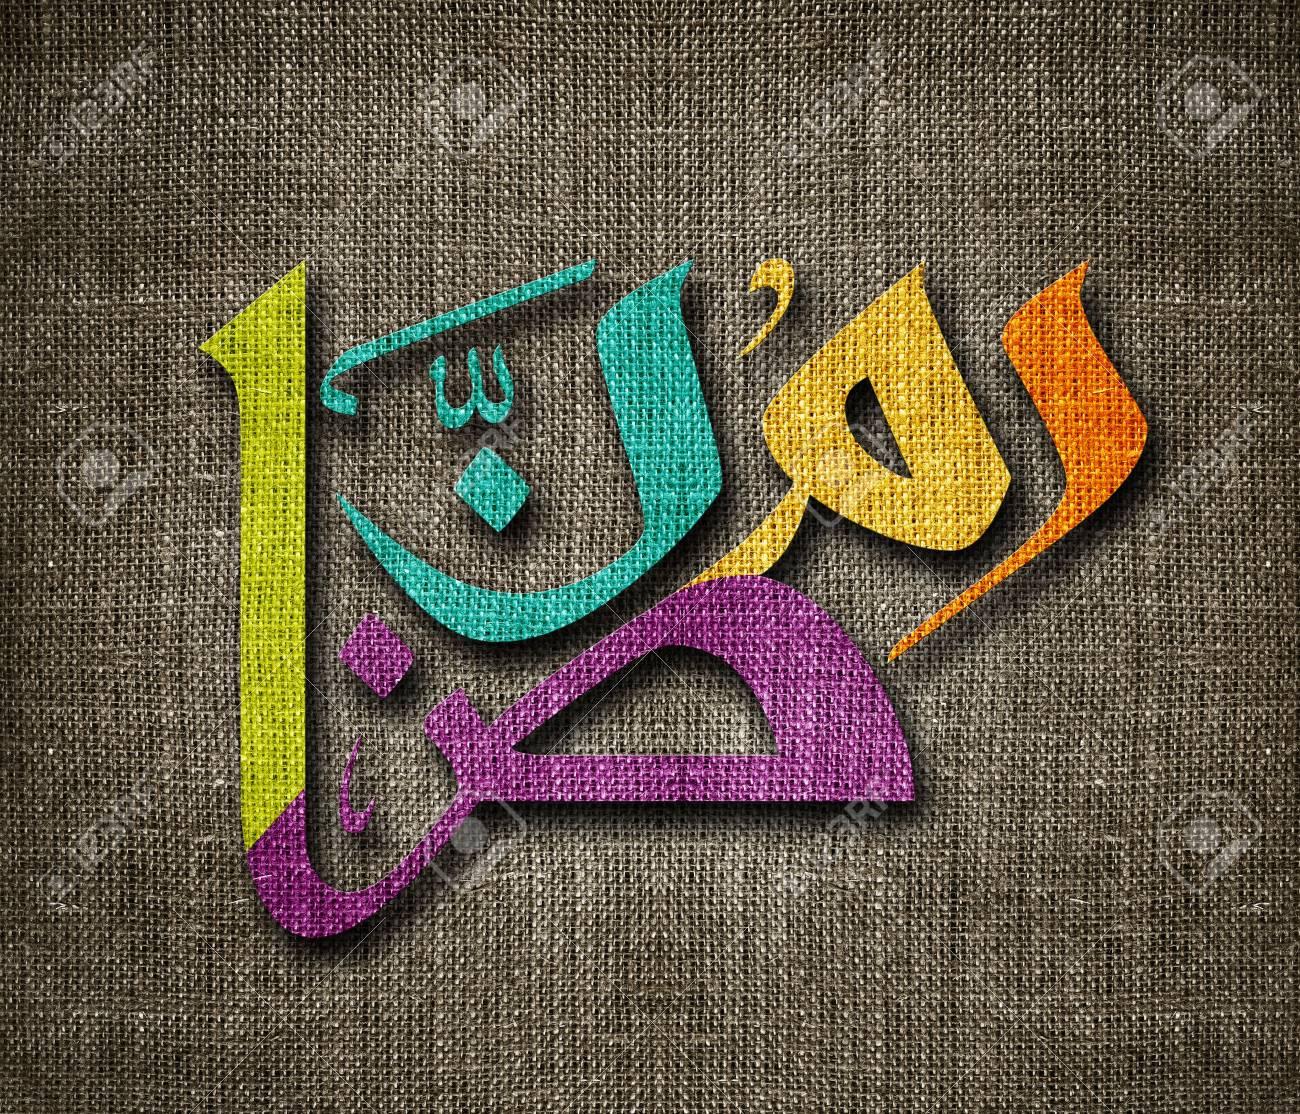 Great Ramadan Eid Al-Fitr Greeting - 39373241-the-holy-month-of-muslim-community-festival-ramadan-kareem-and-eid-al-fitr-greeting-card-with-arabic  Collection_821124 .jpg